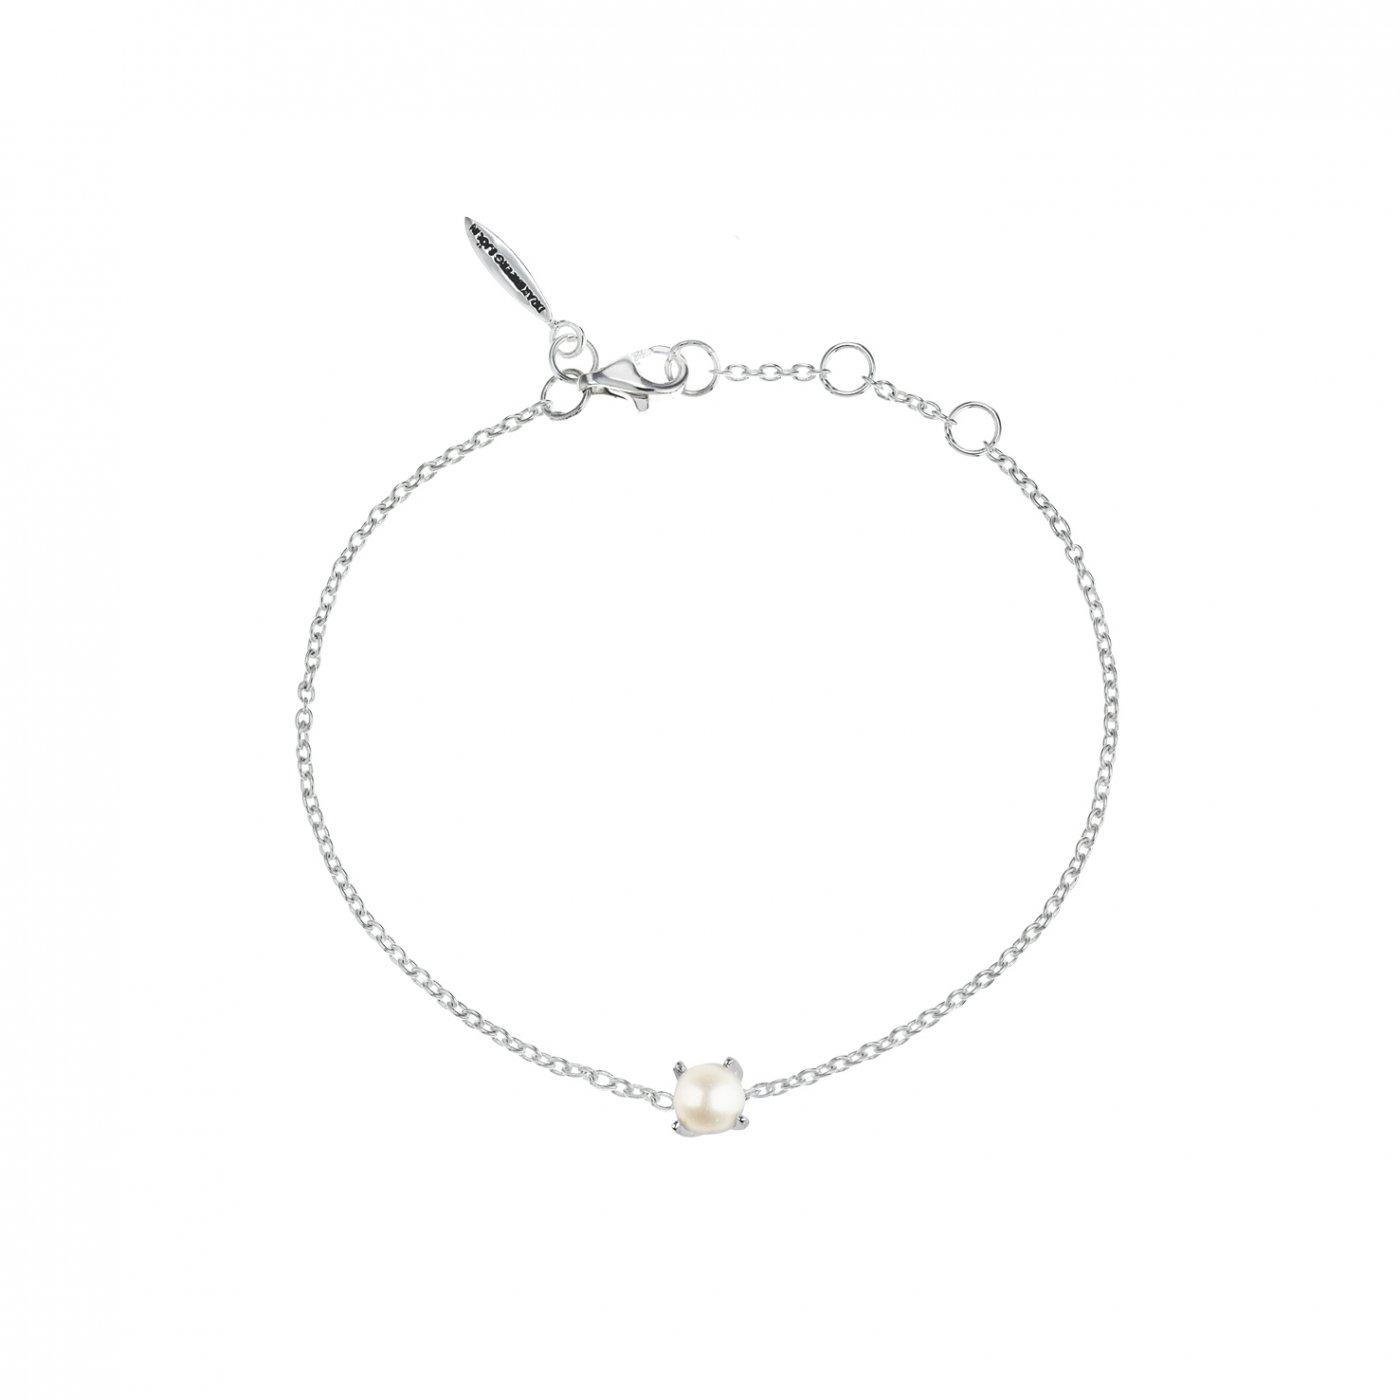 Petite-Pearl-drop-bracelet-1400x1400